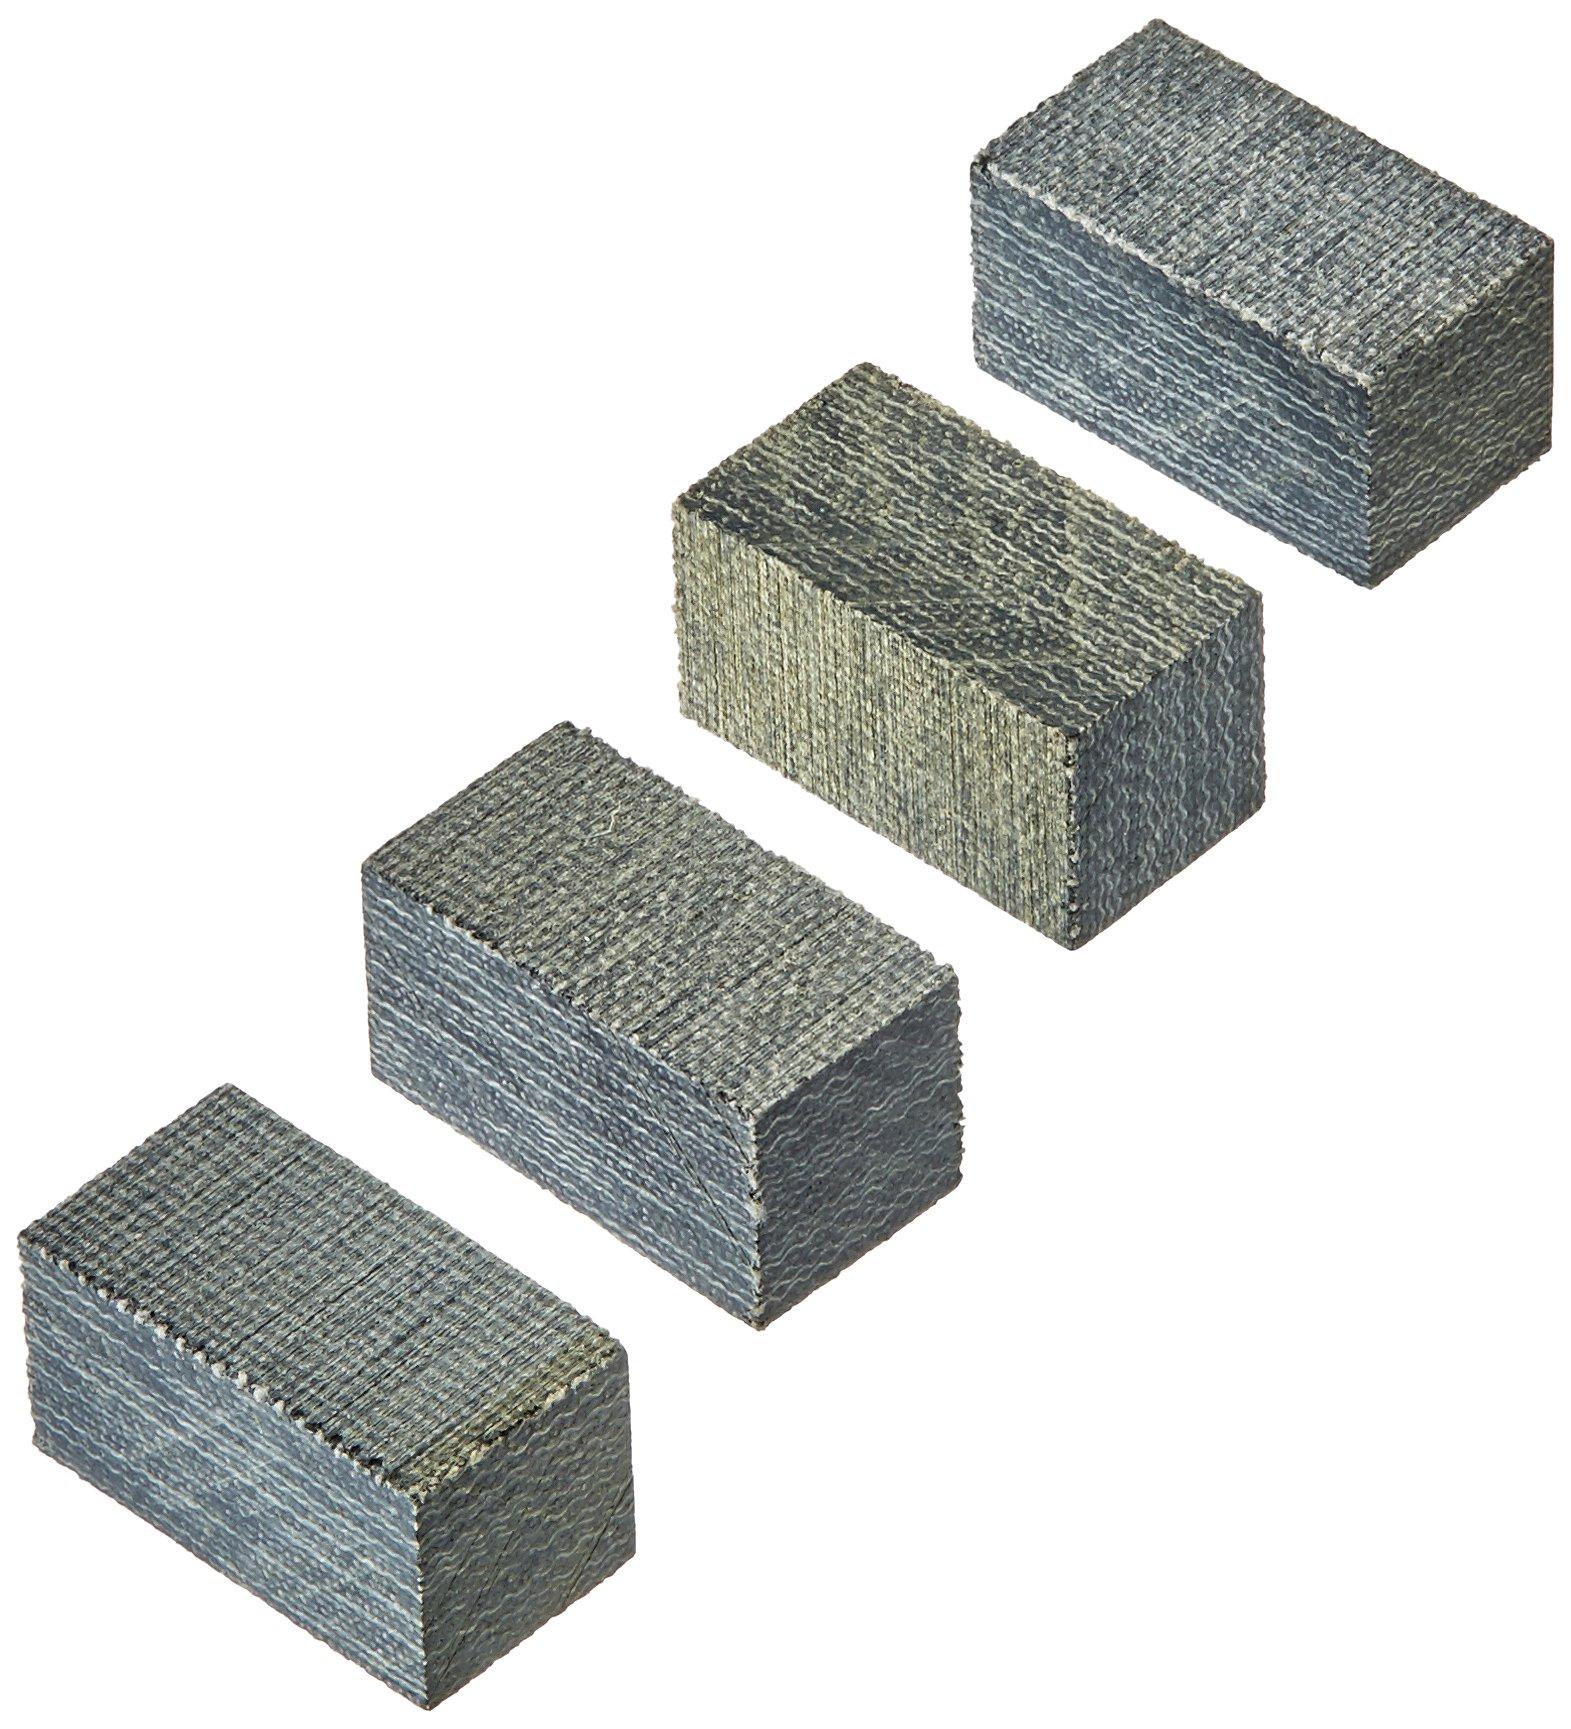 Olson Saw CB50050BL Imported 14-Inch Band Saw Accessory Cool Blocks